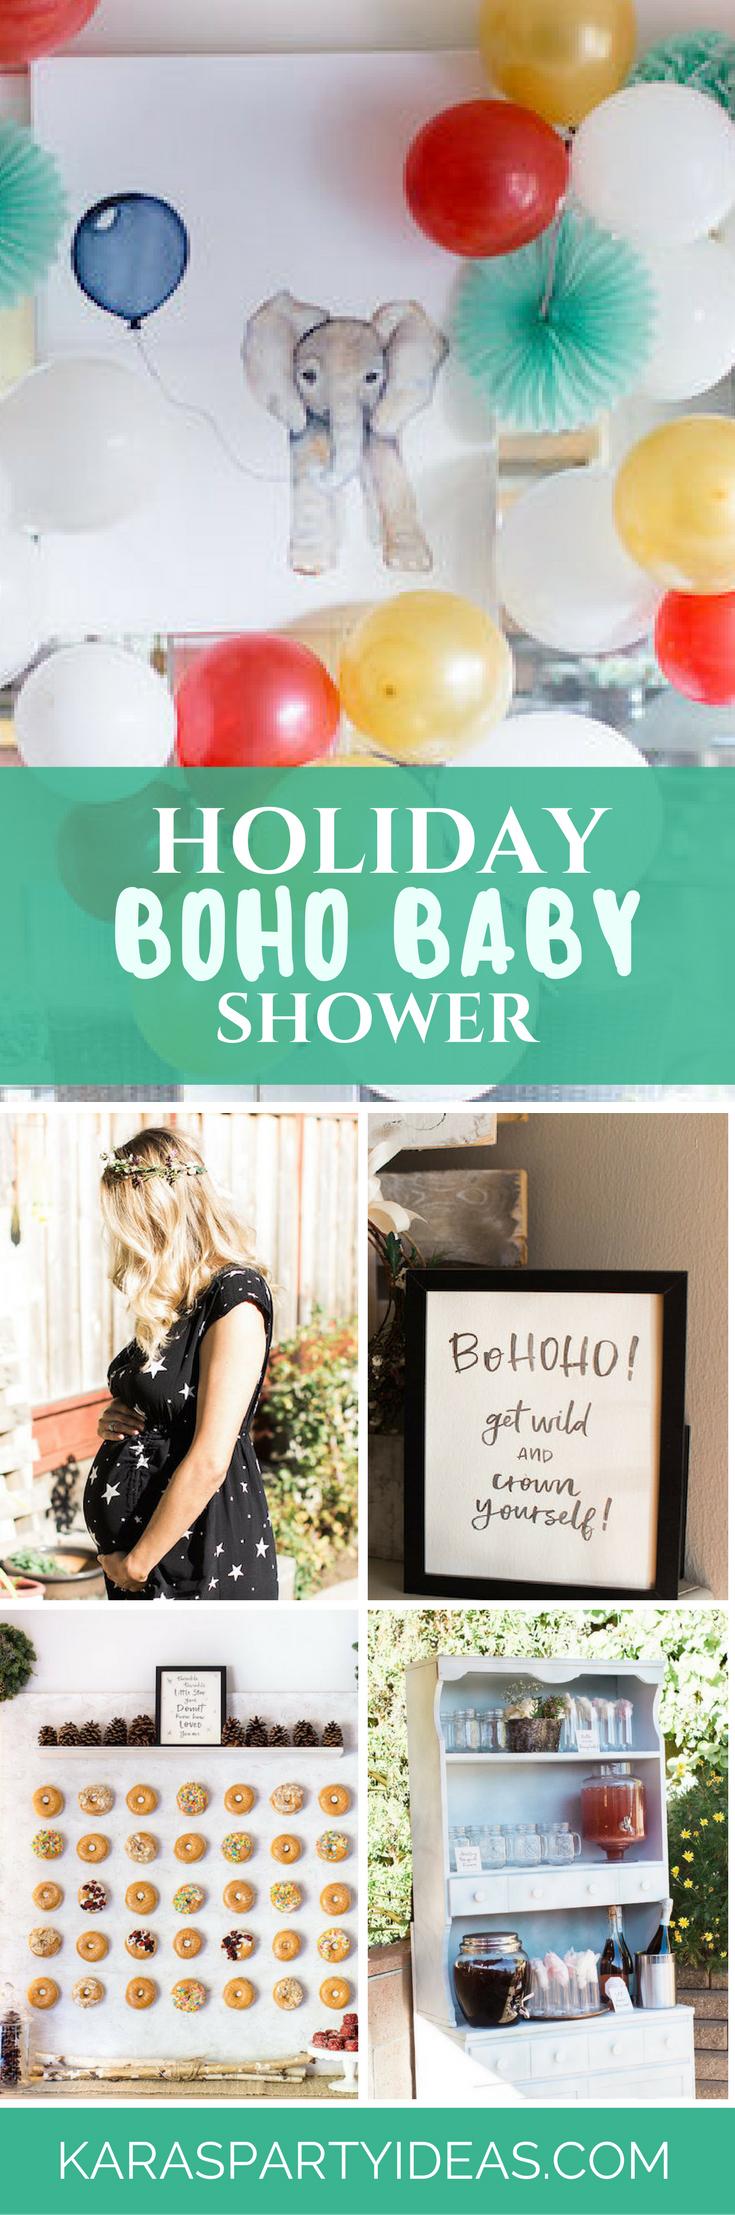 Holiday Boho Baby Shower via Kara's Party Ideas - KarasPartyIdeas.com